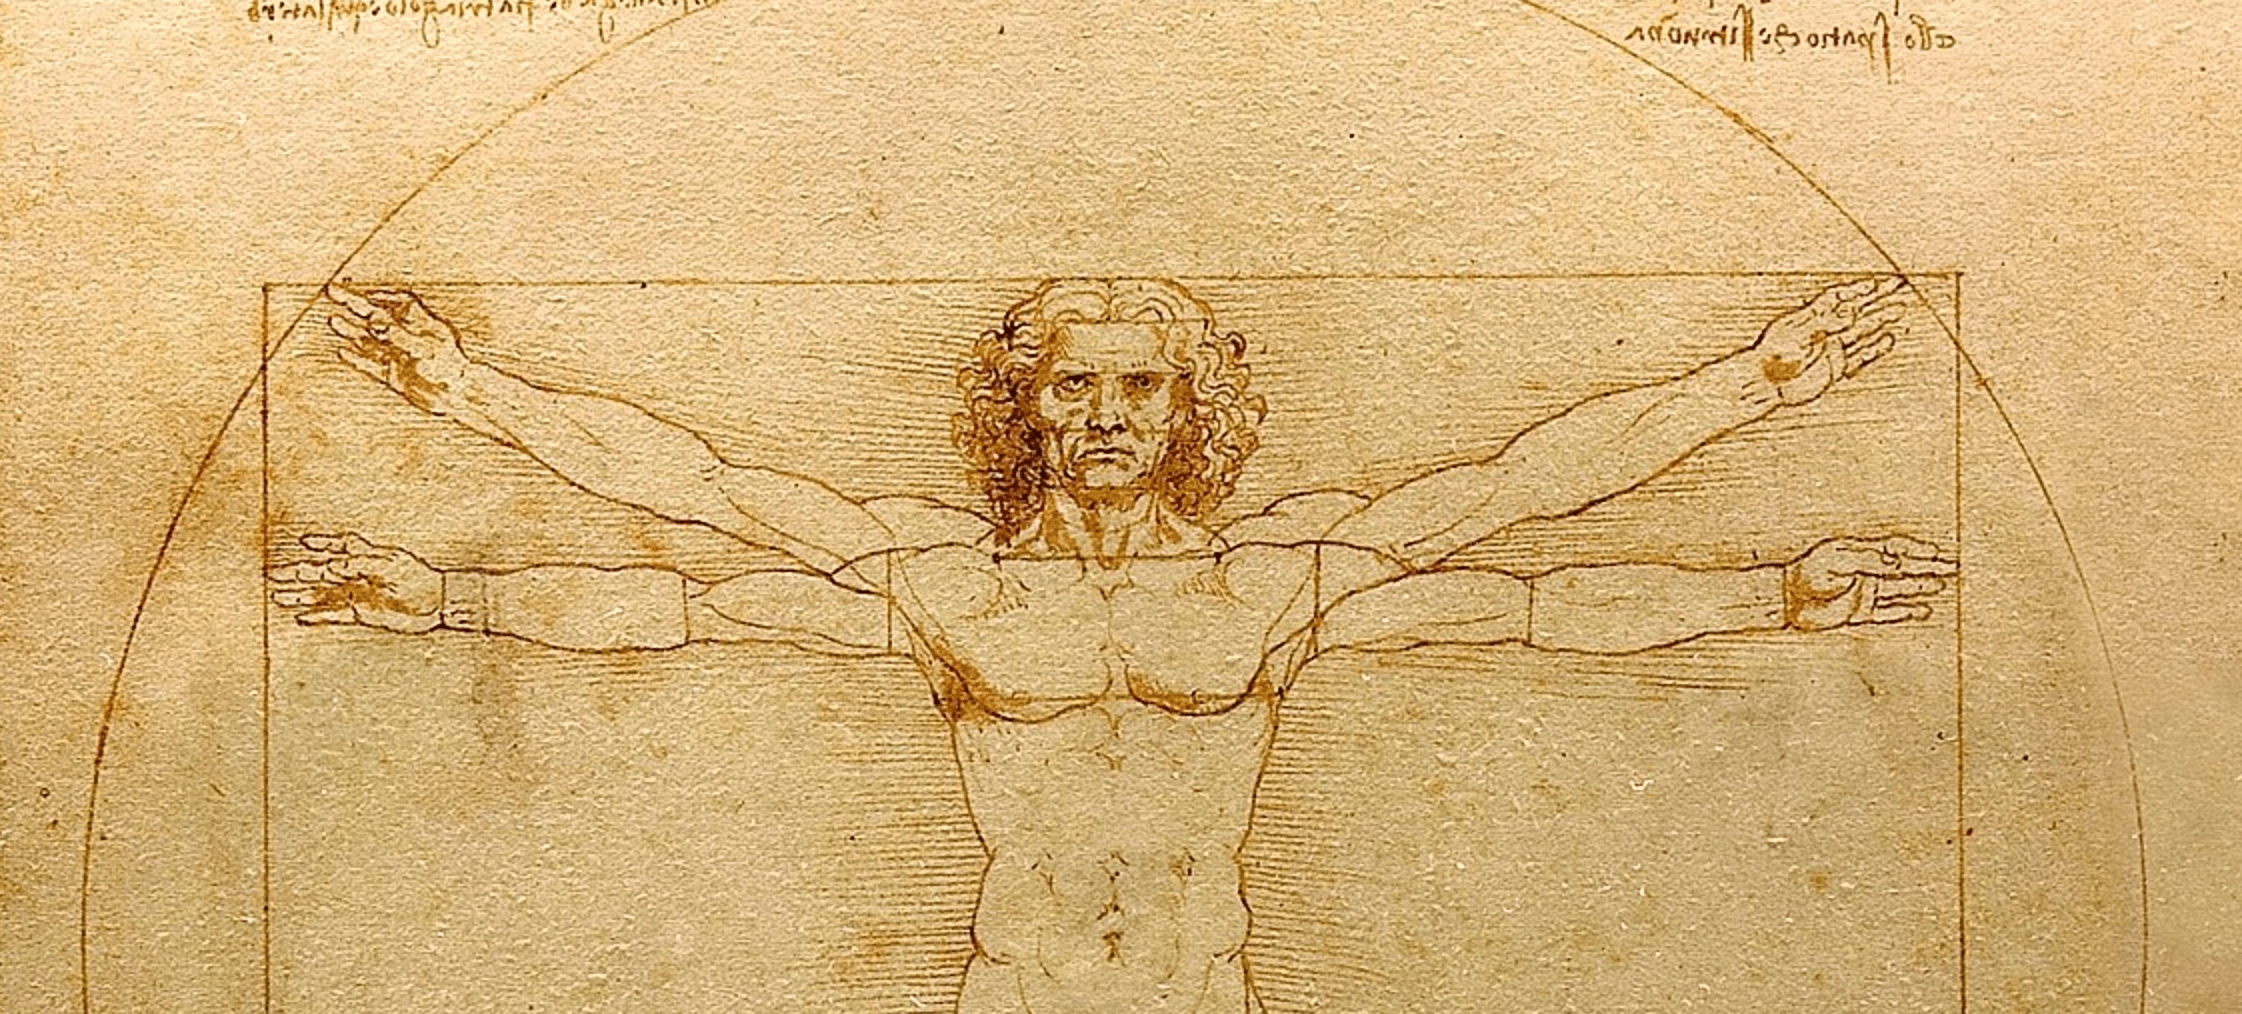 Leonardo D Exhibition : The arts shelf u2013 leonardo da vincis vitruvian man to be unveiled